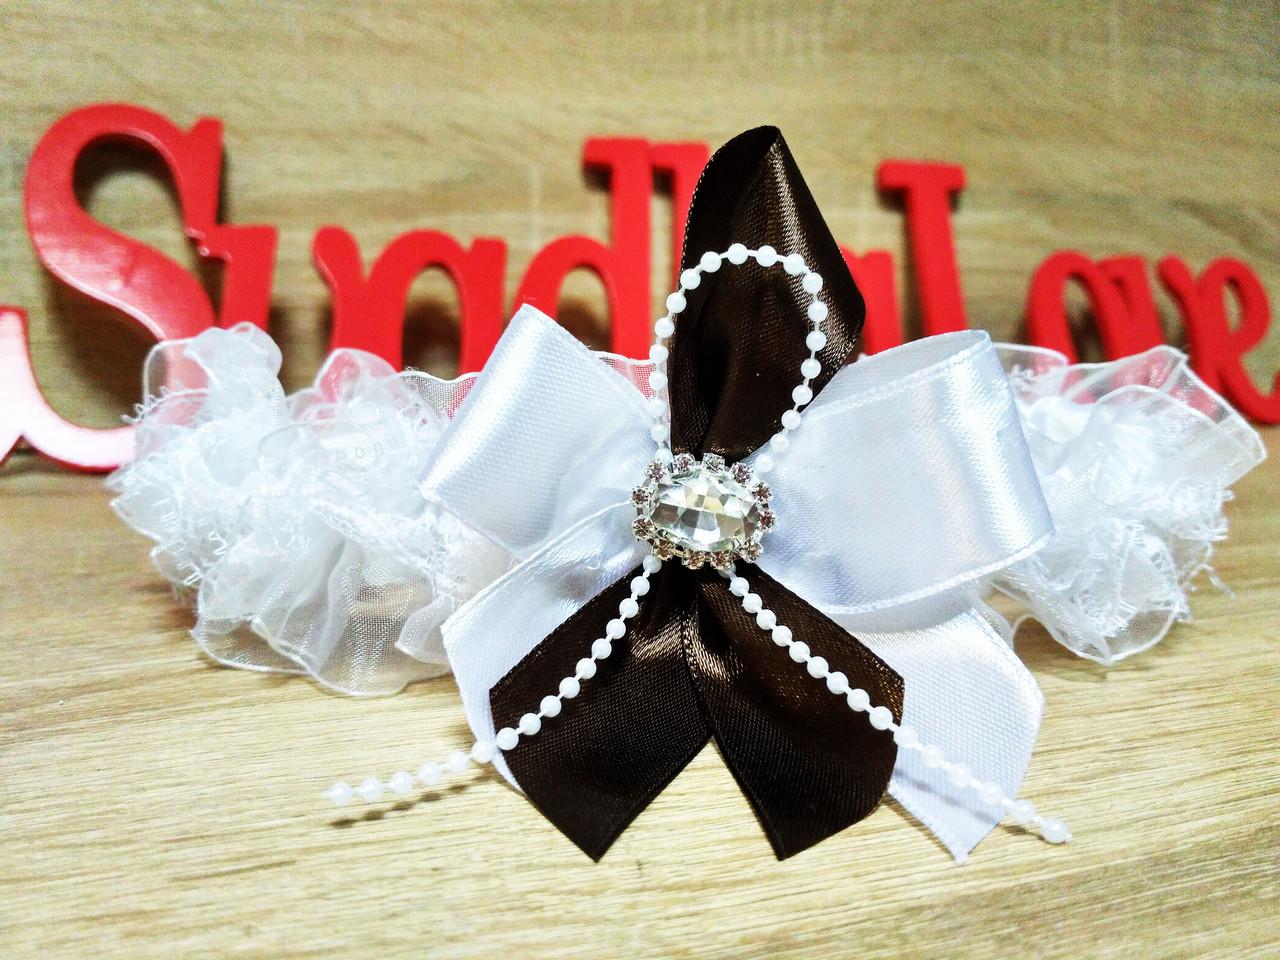 Свадебная подвязка Stile. Цвет шоколад.